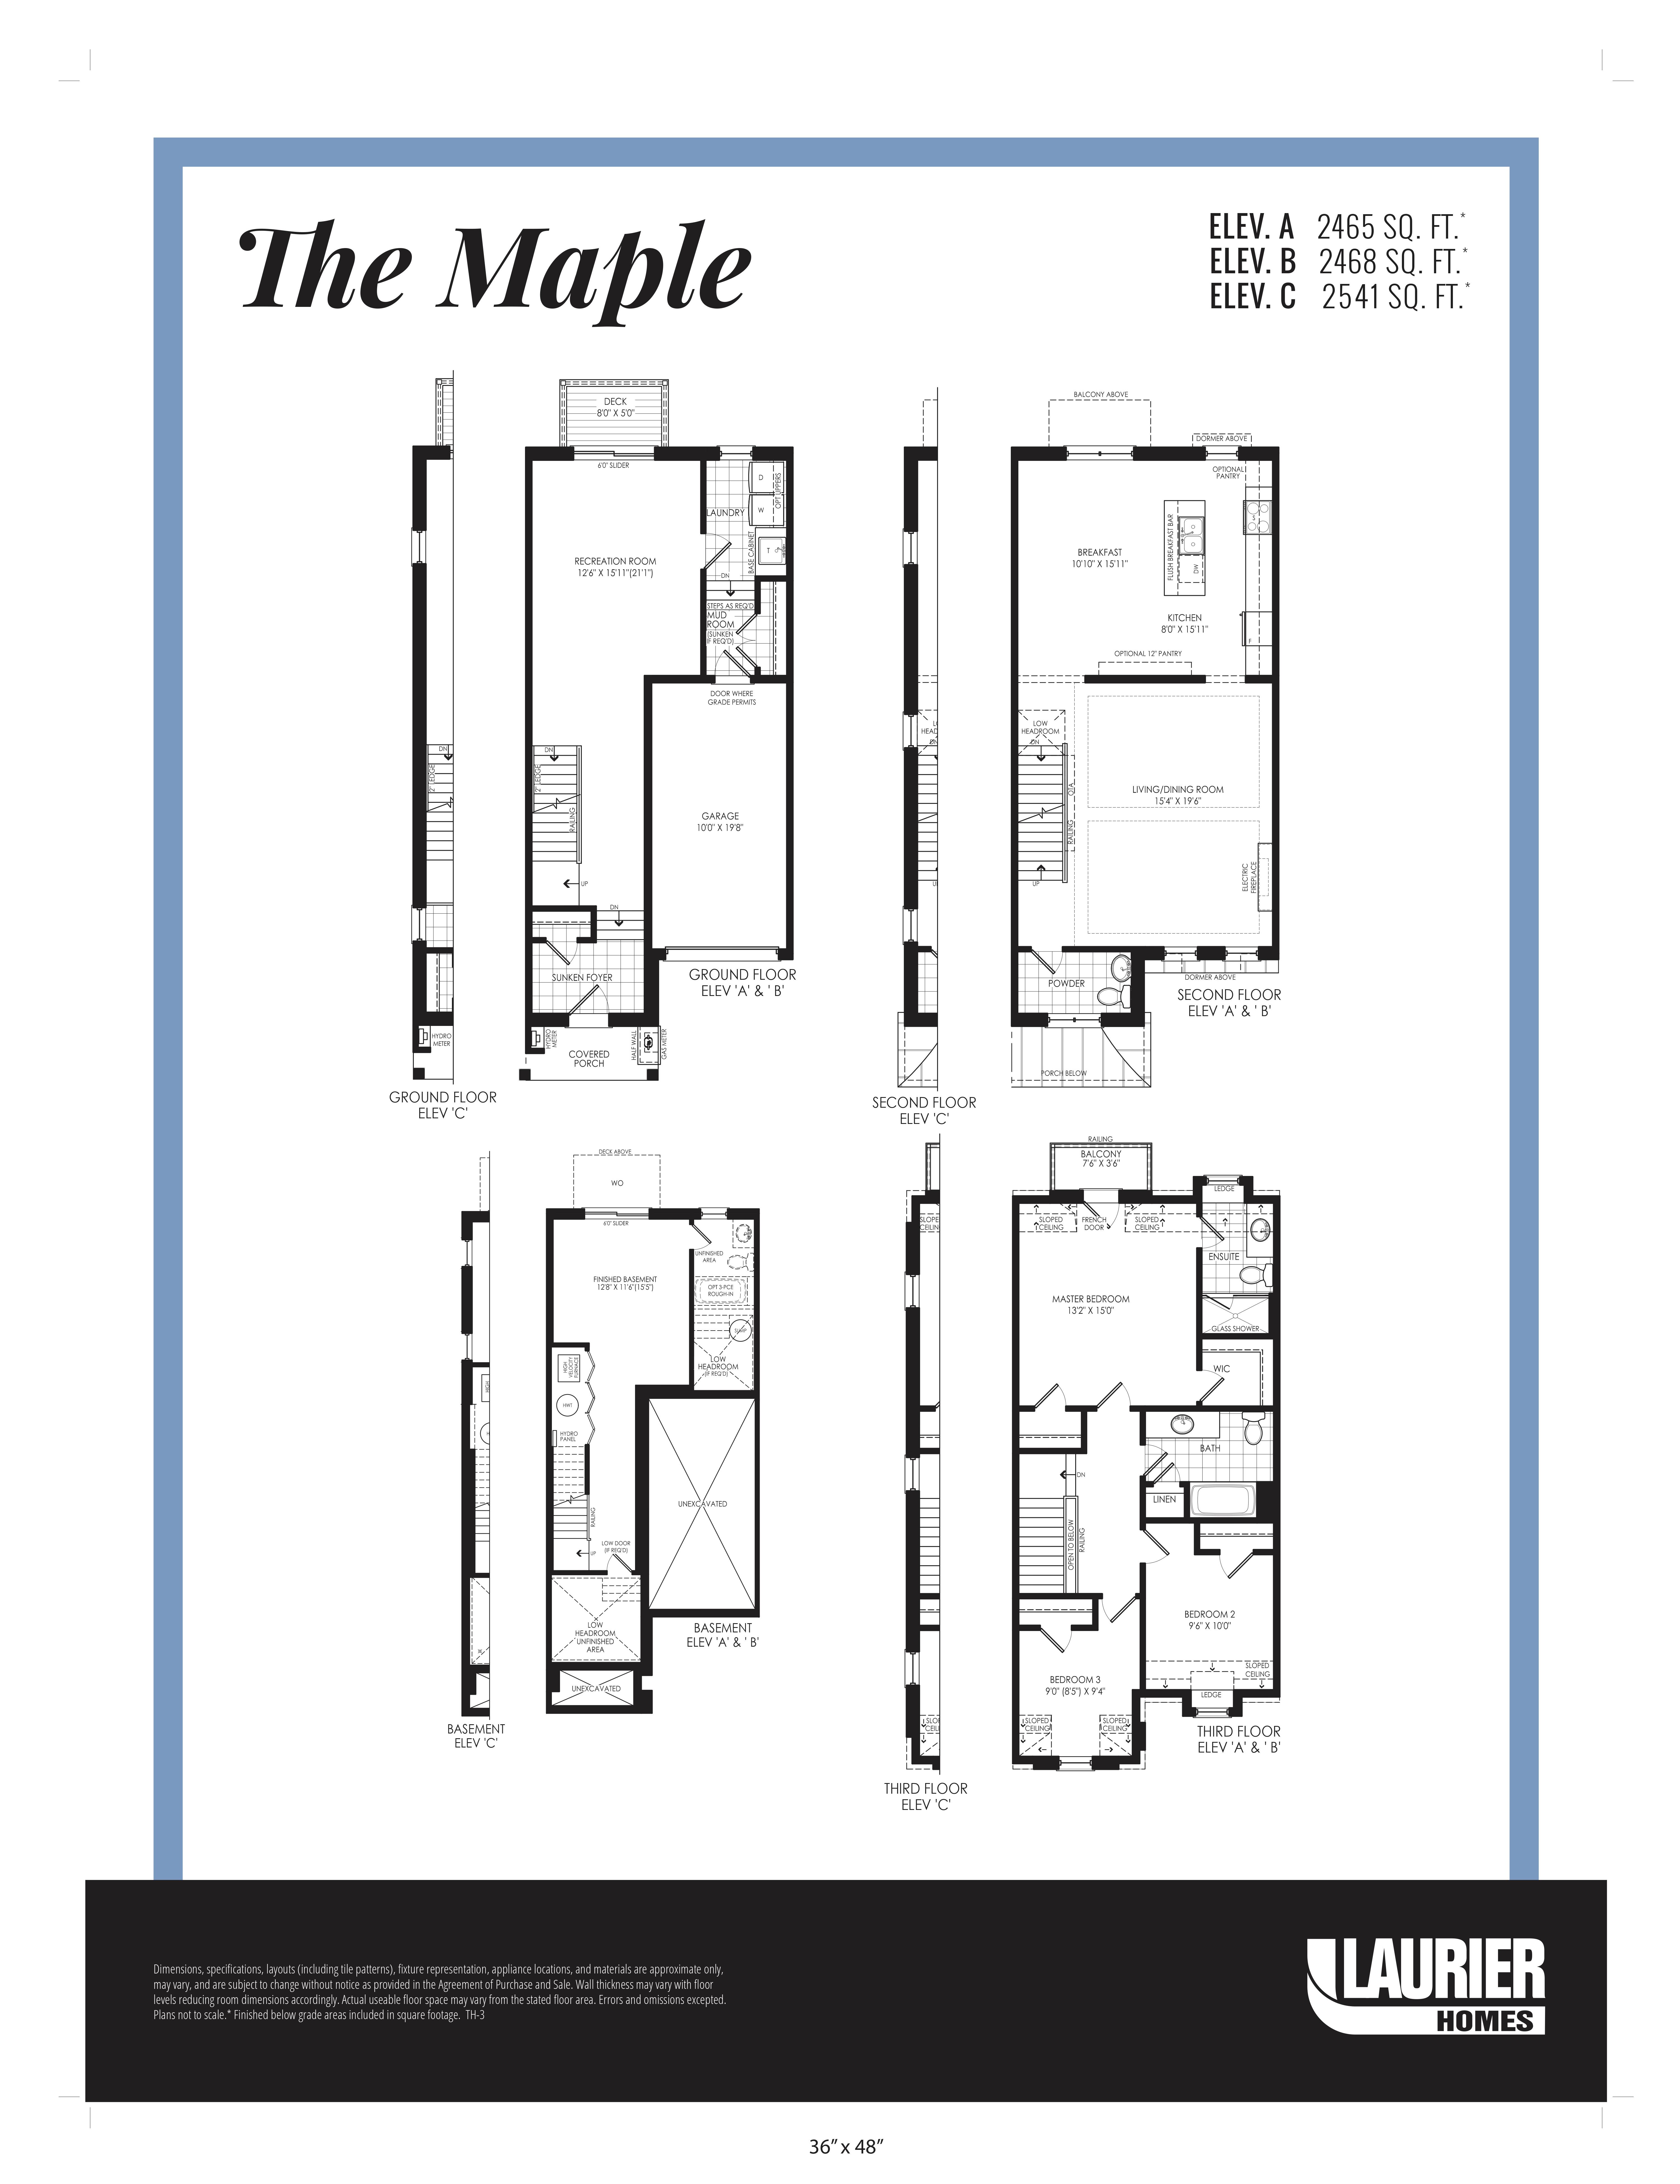 Floor plan of The Maple